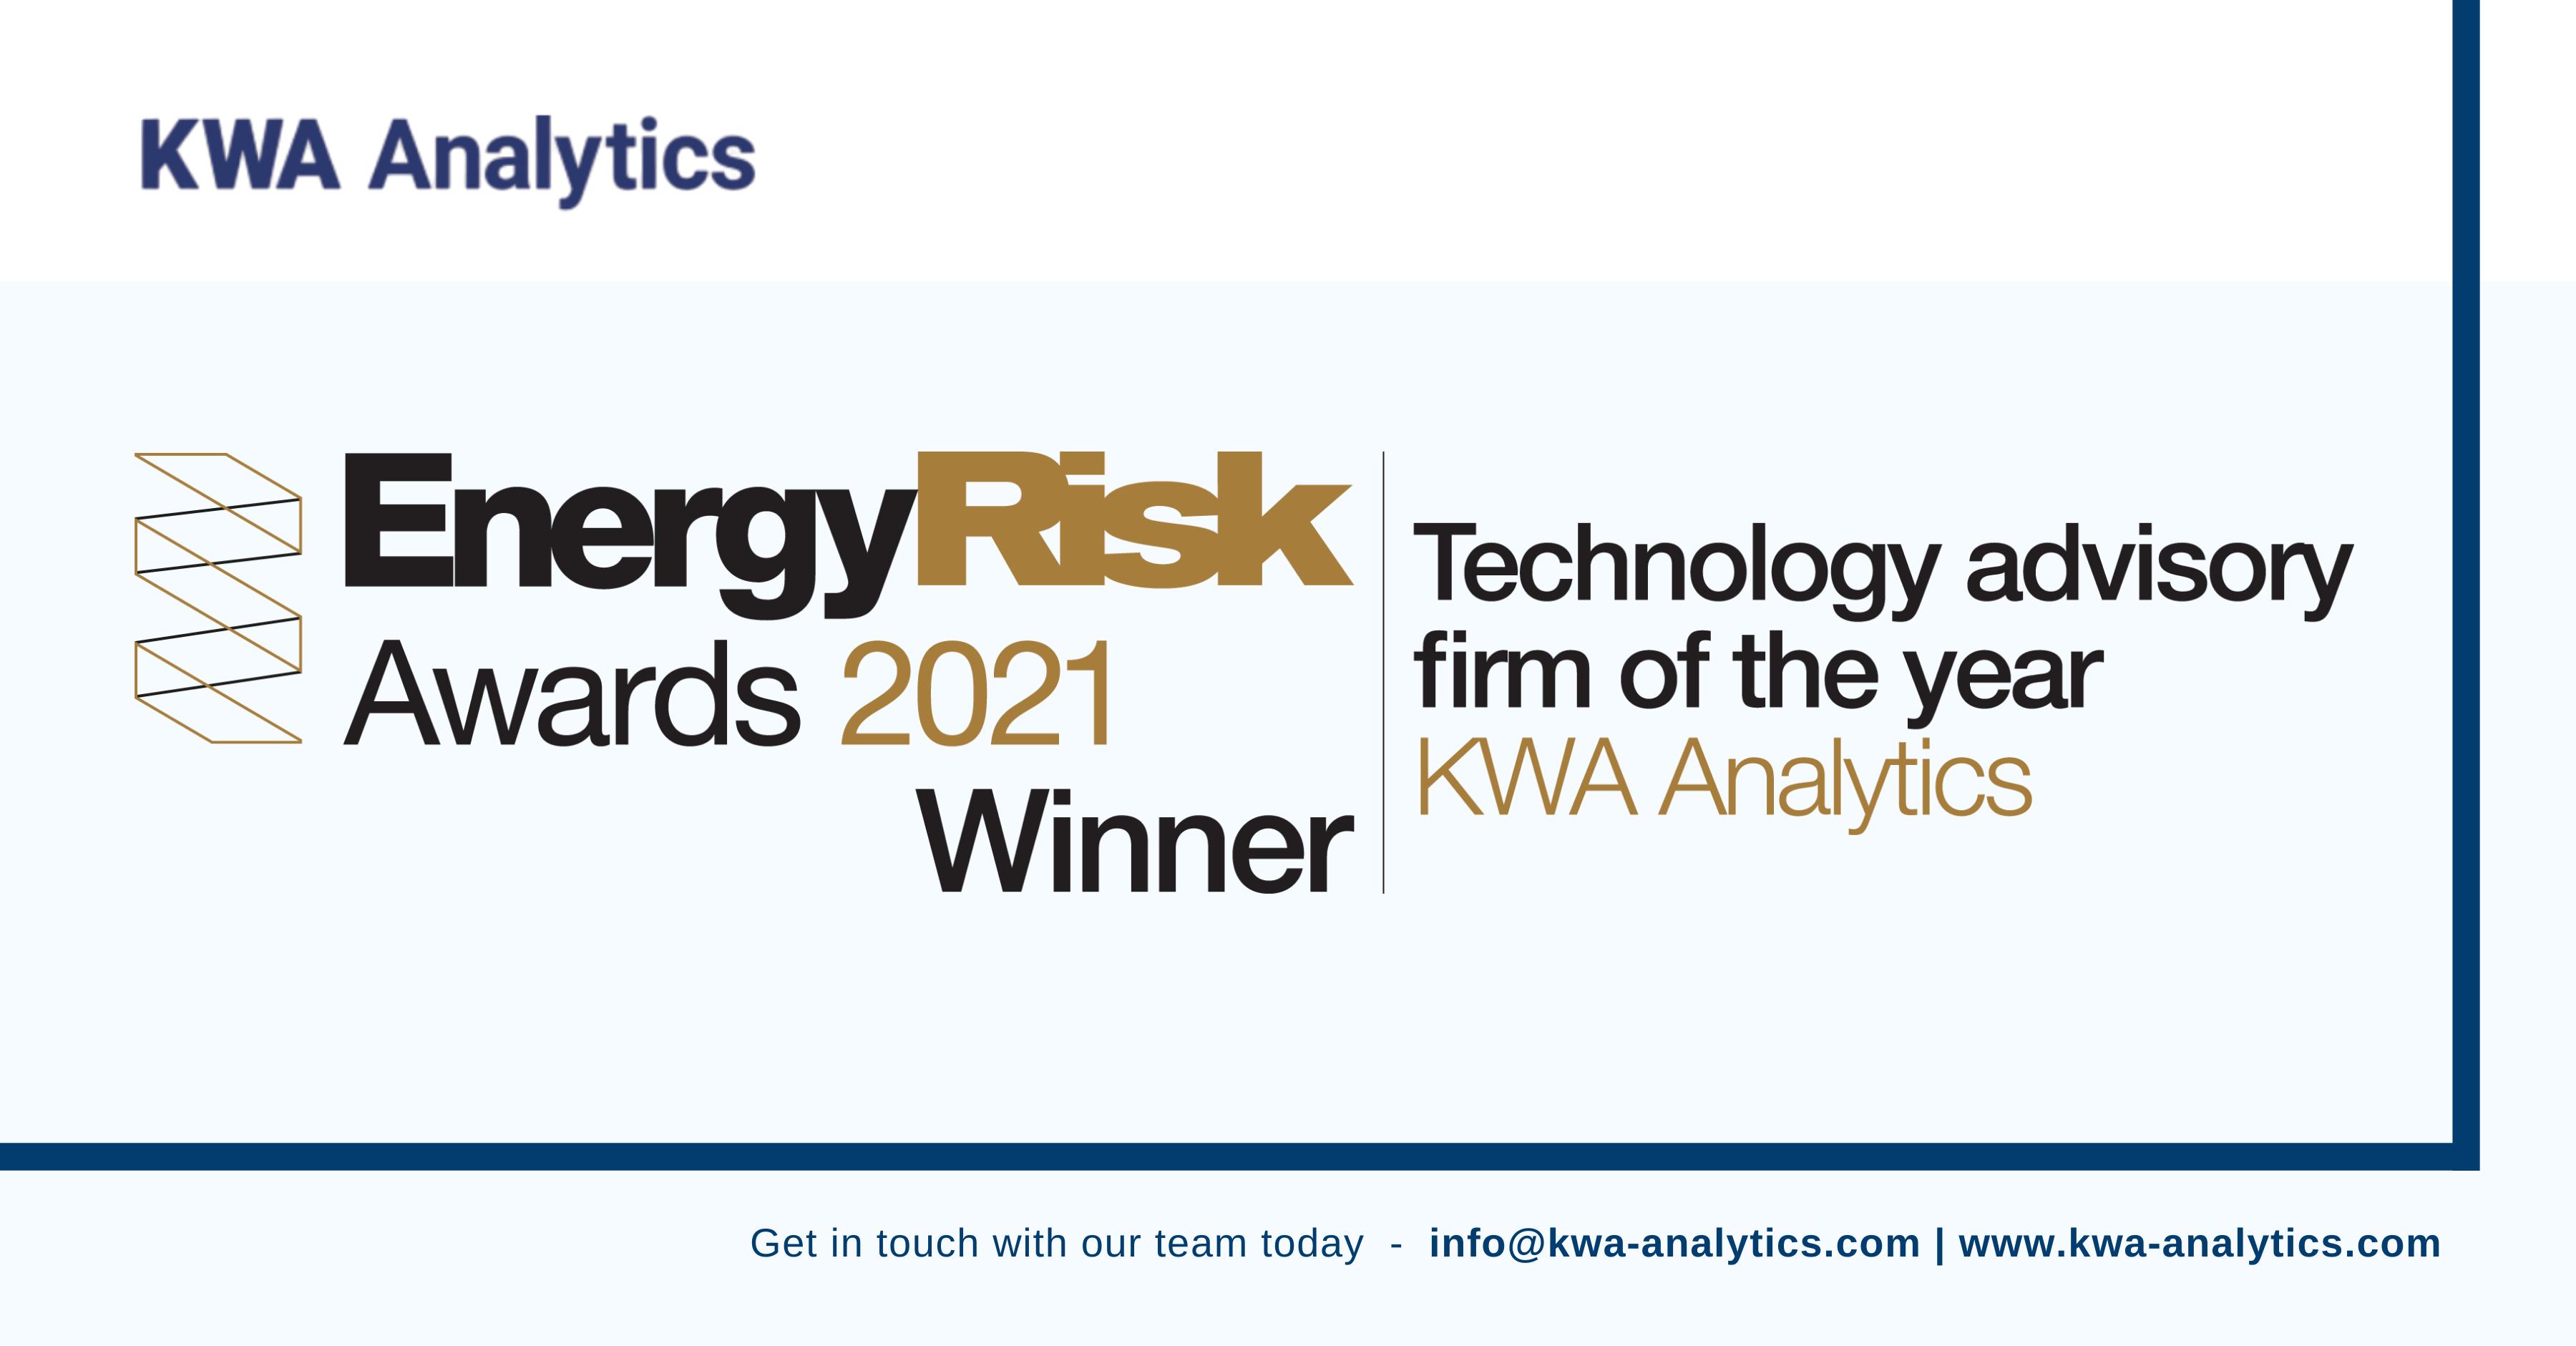 KWA Analytics Win Technology Advisory Firm of the Year 2021